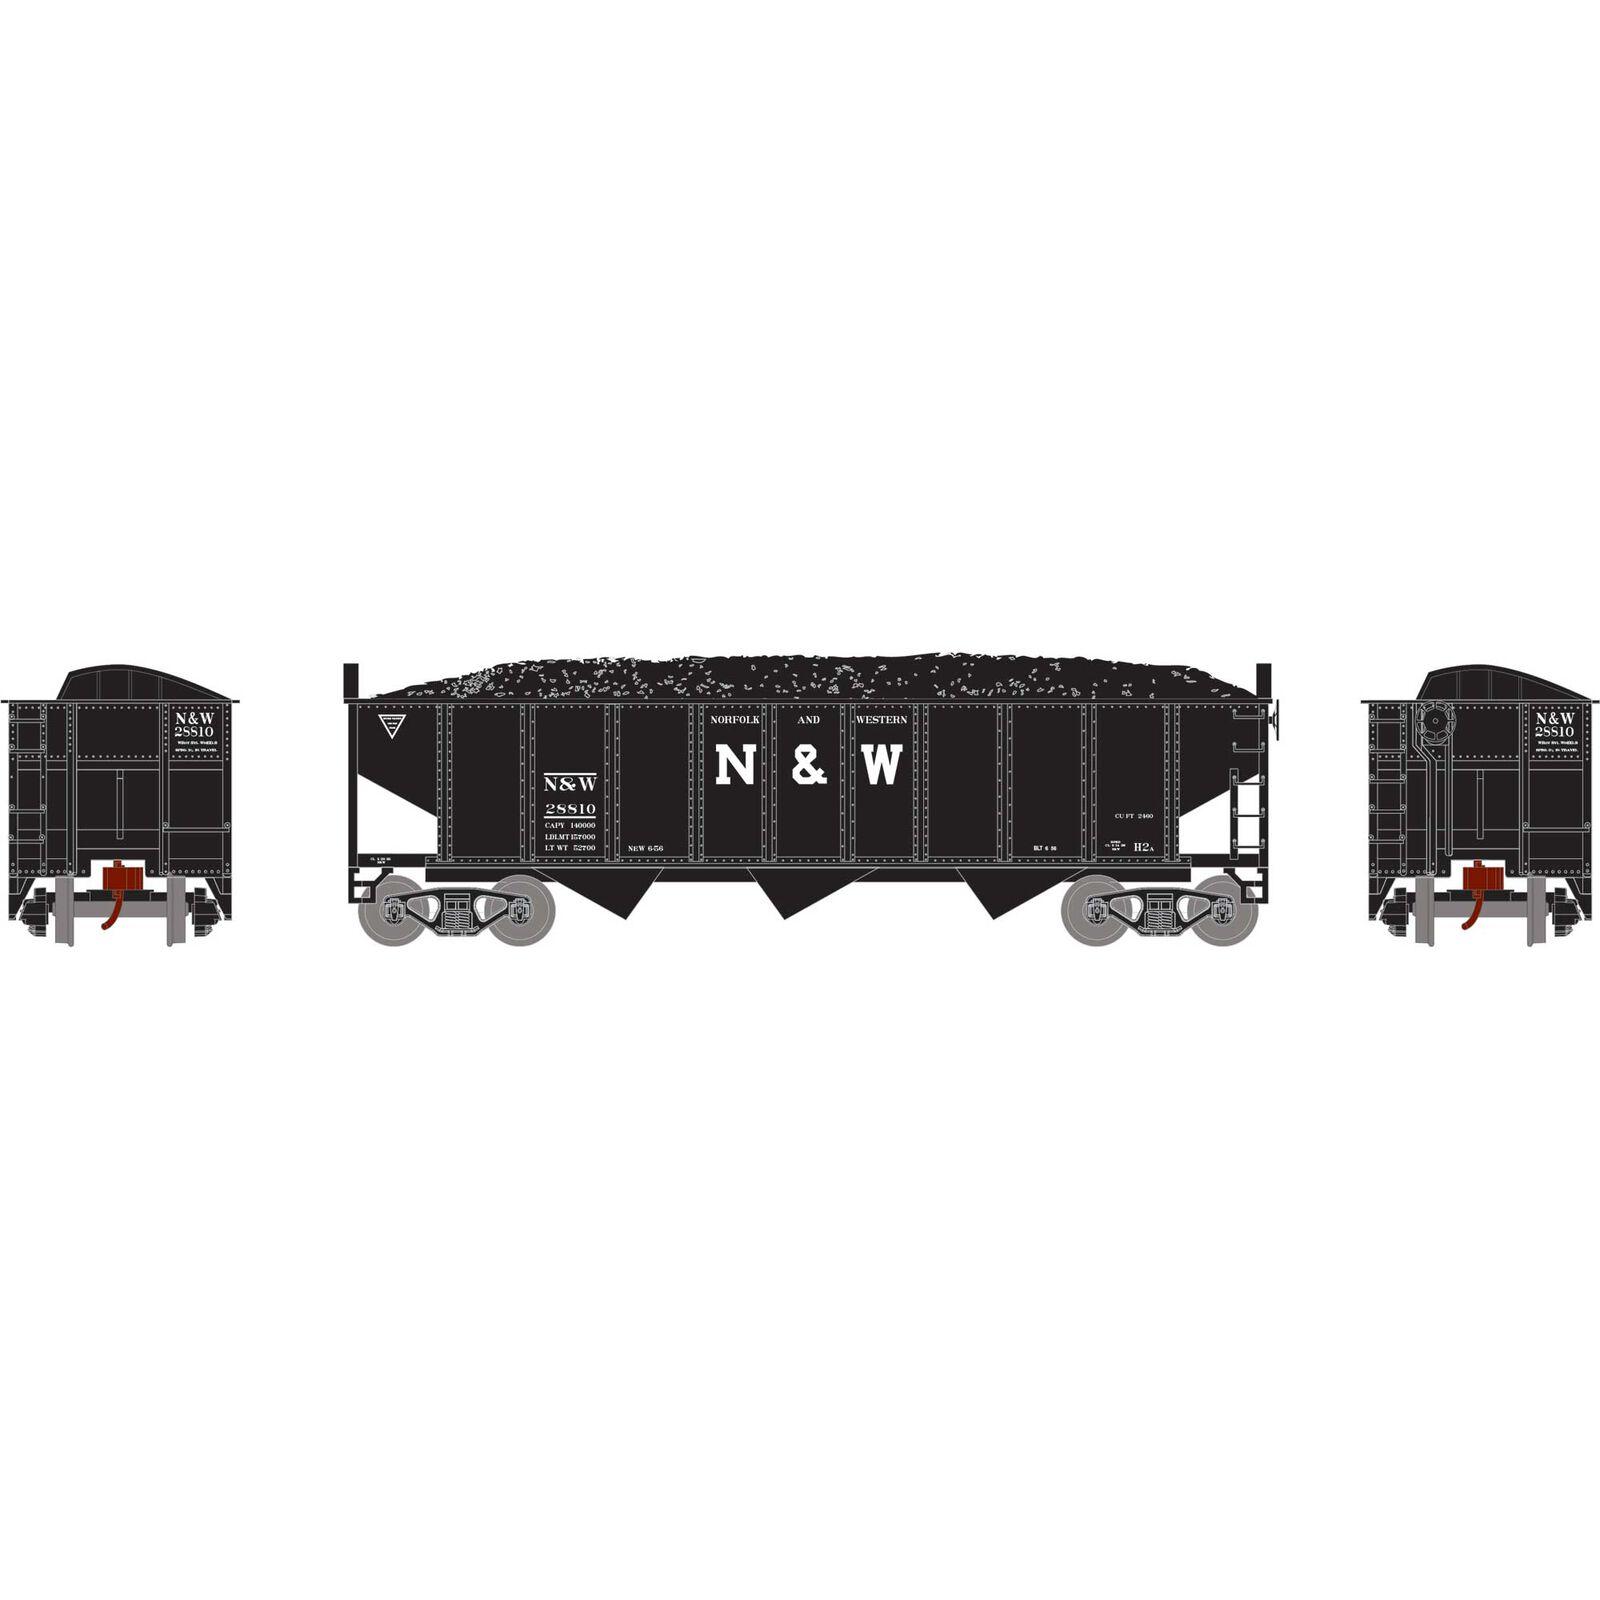 N 40' 3-Bay Ribbed Hopper with Load, N&W #28810